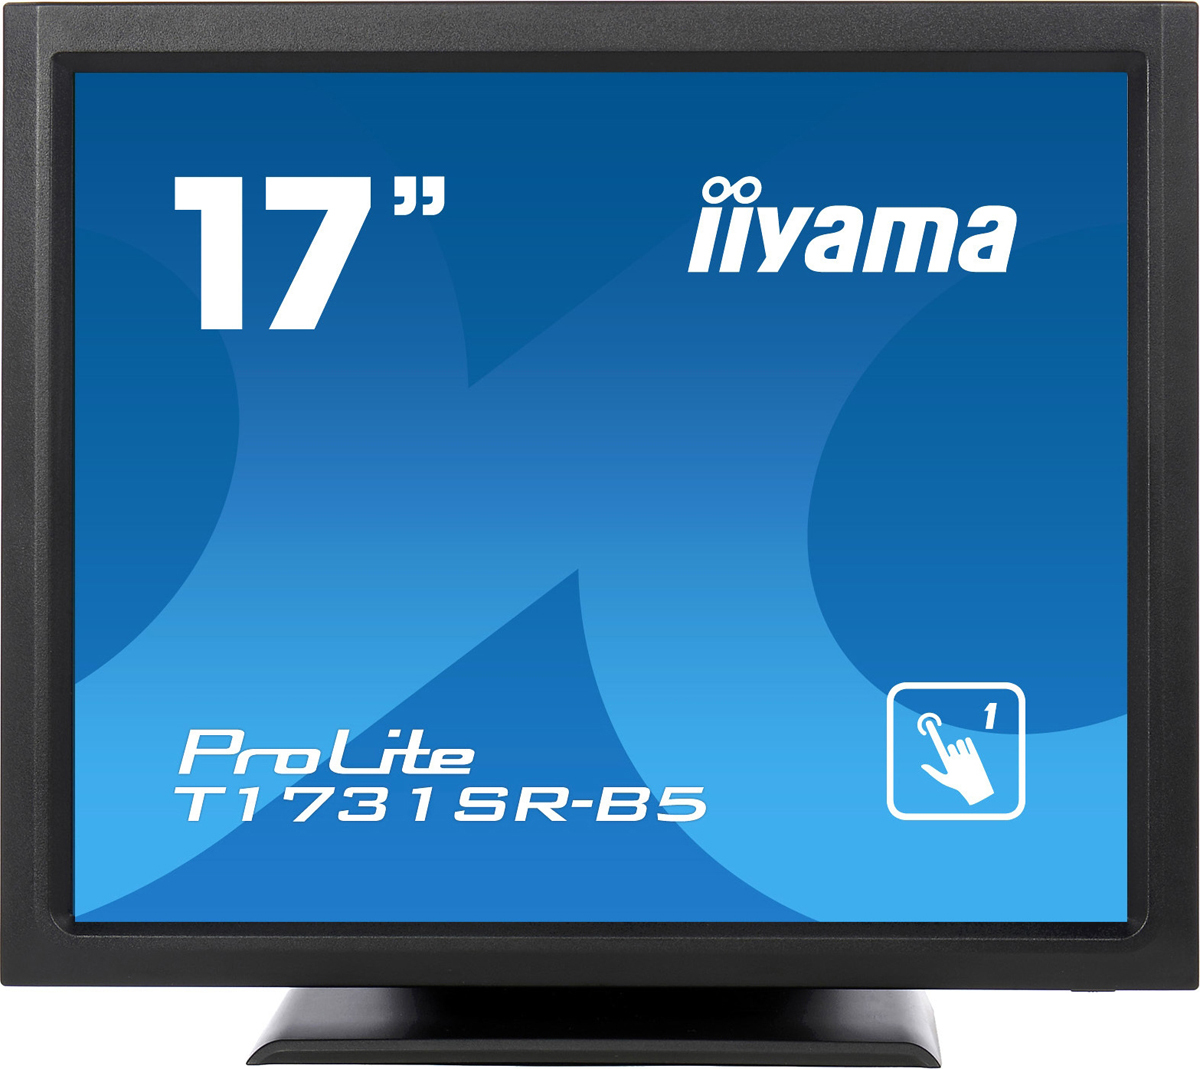 "17"" Монитор iiyama, ProLite T1731SAW-B5, T1731SAW-B5"